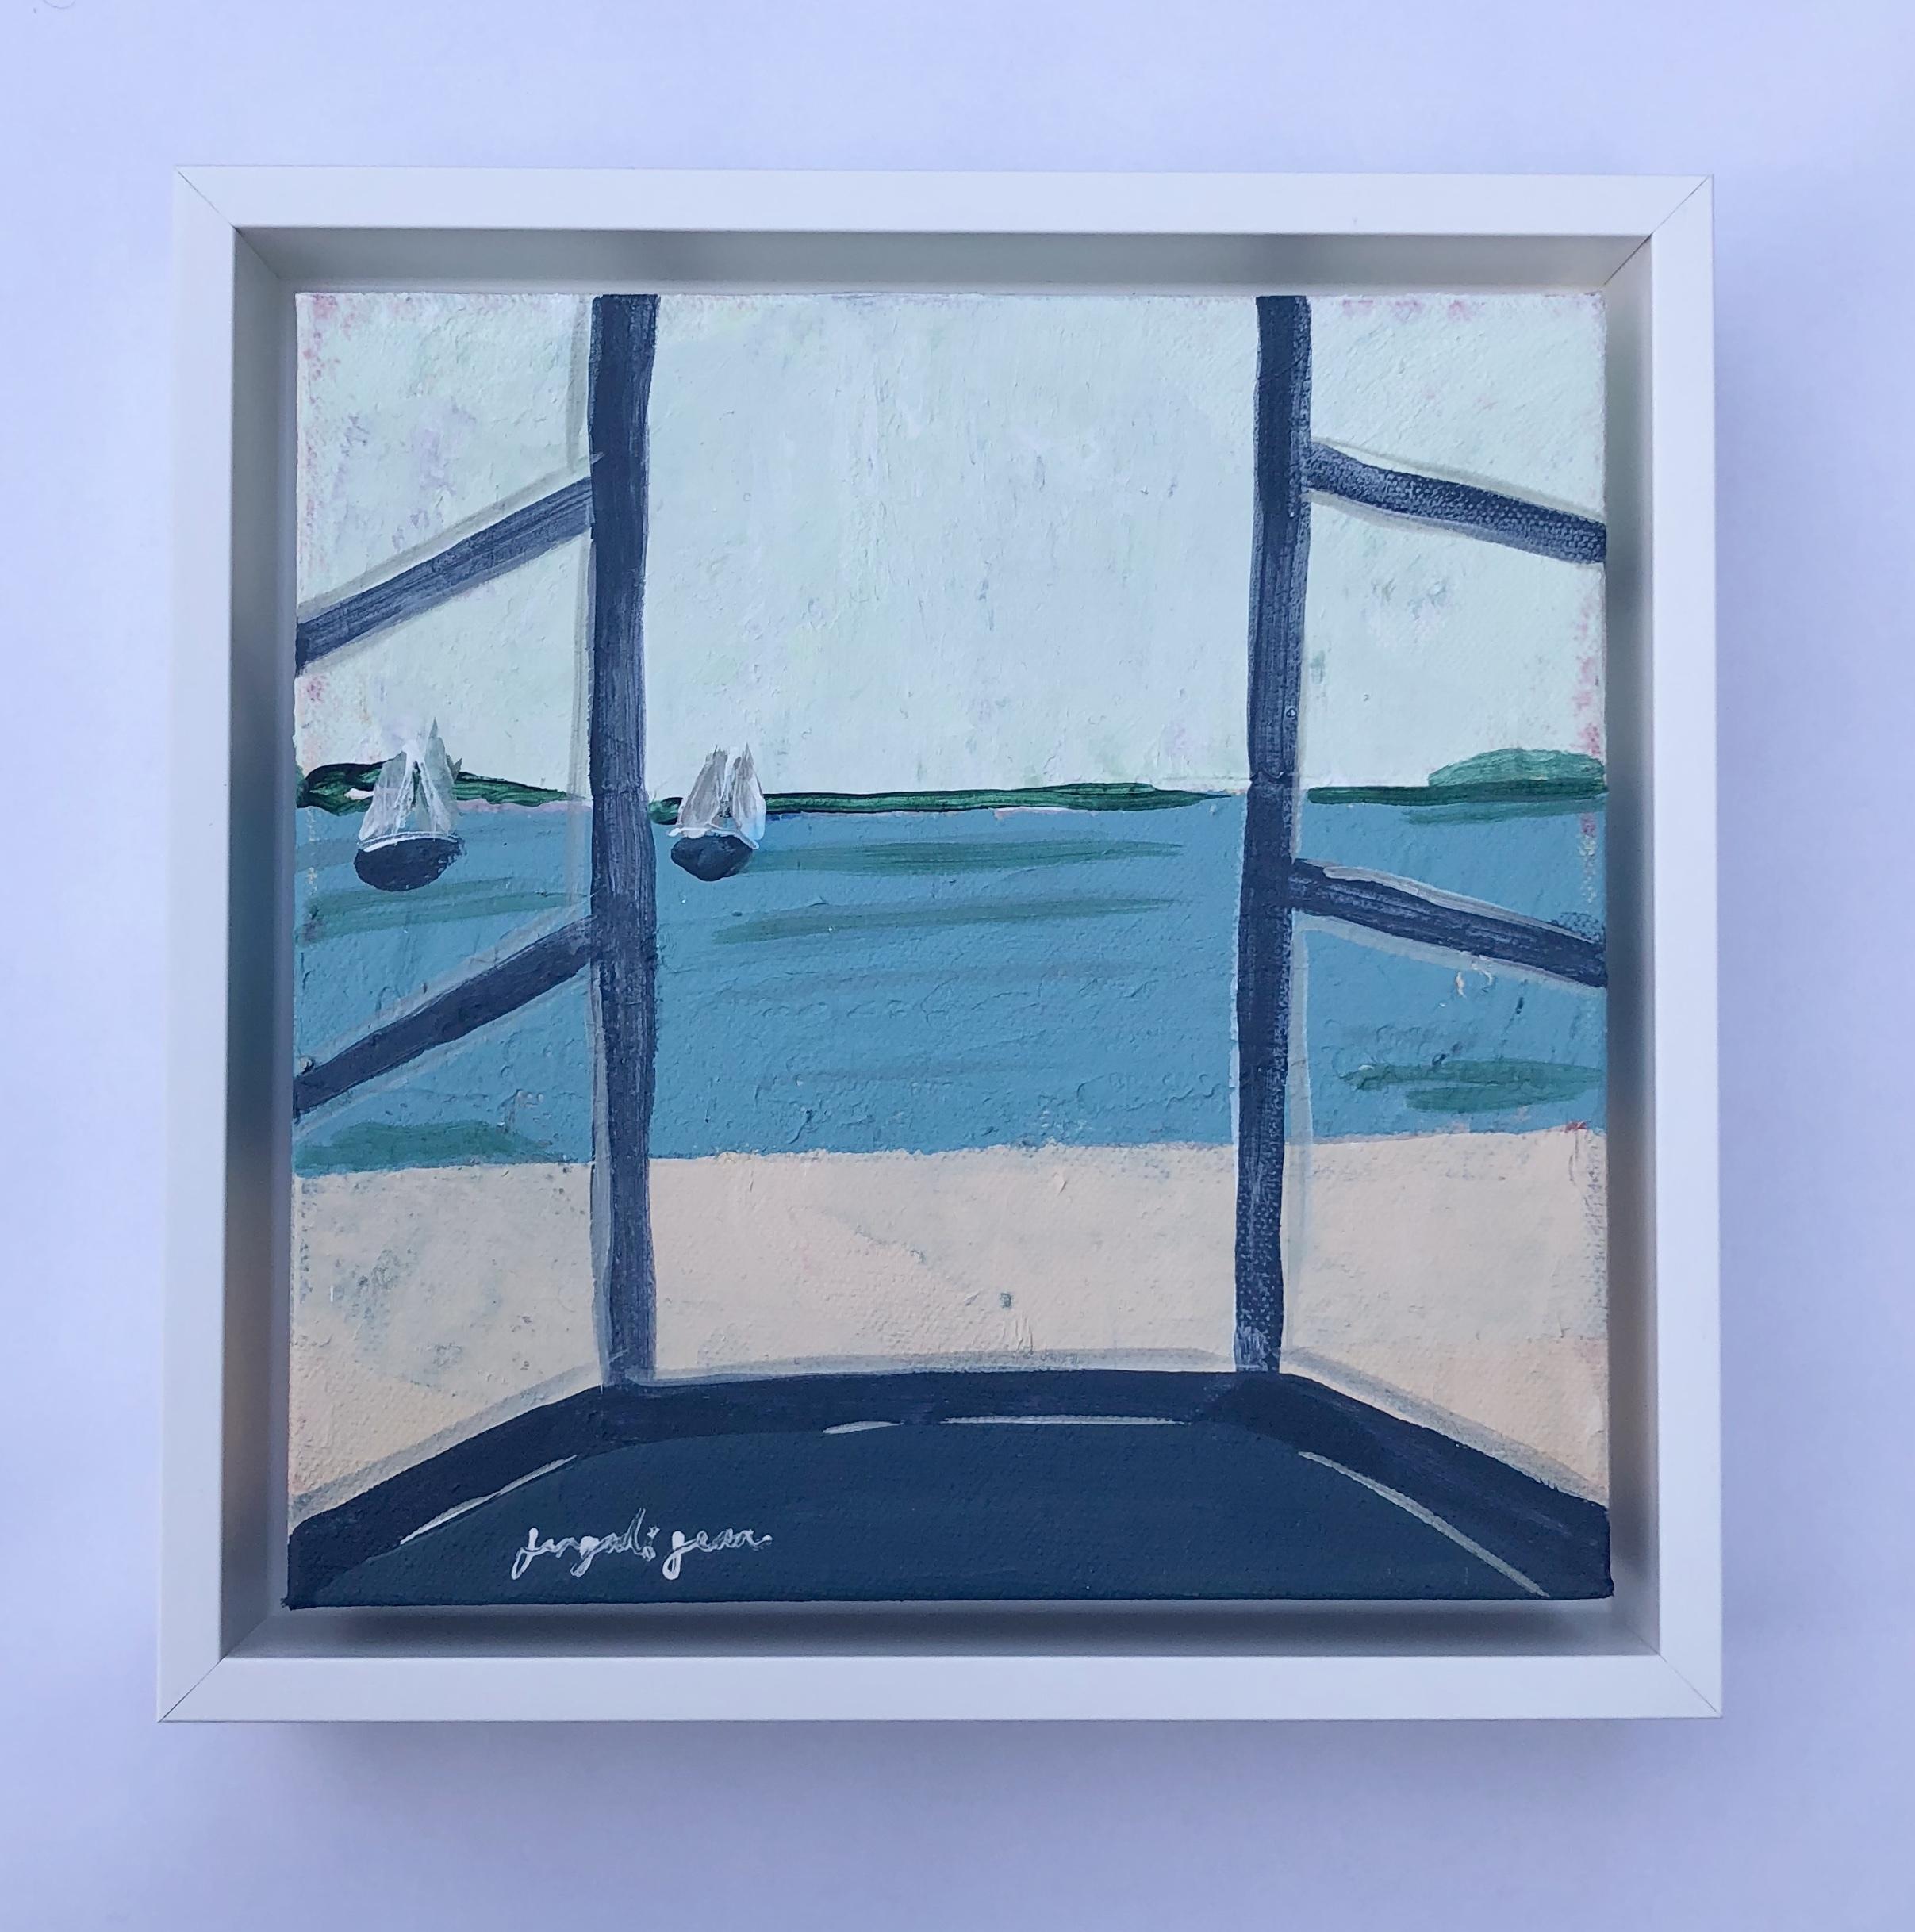 Set Sail on Naragansett Sound (8x8) 00093